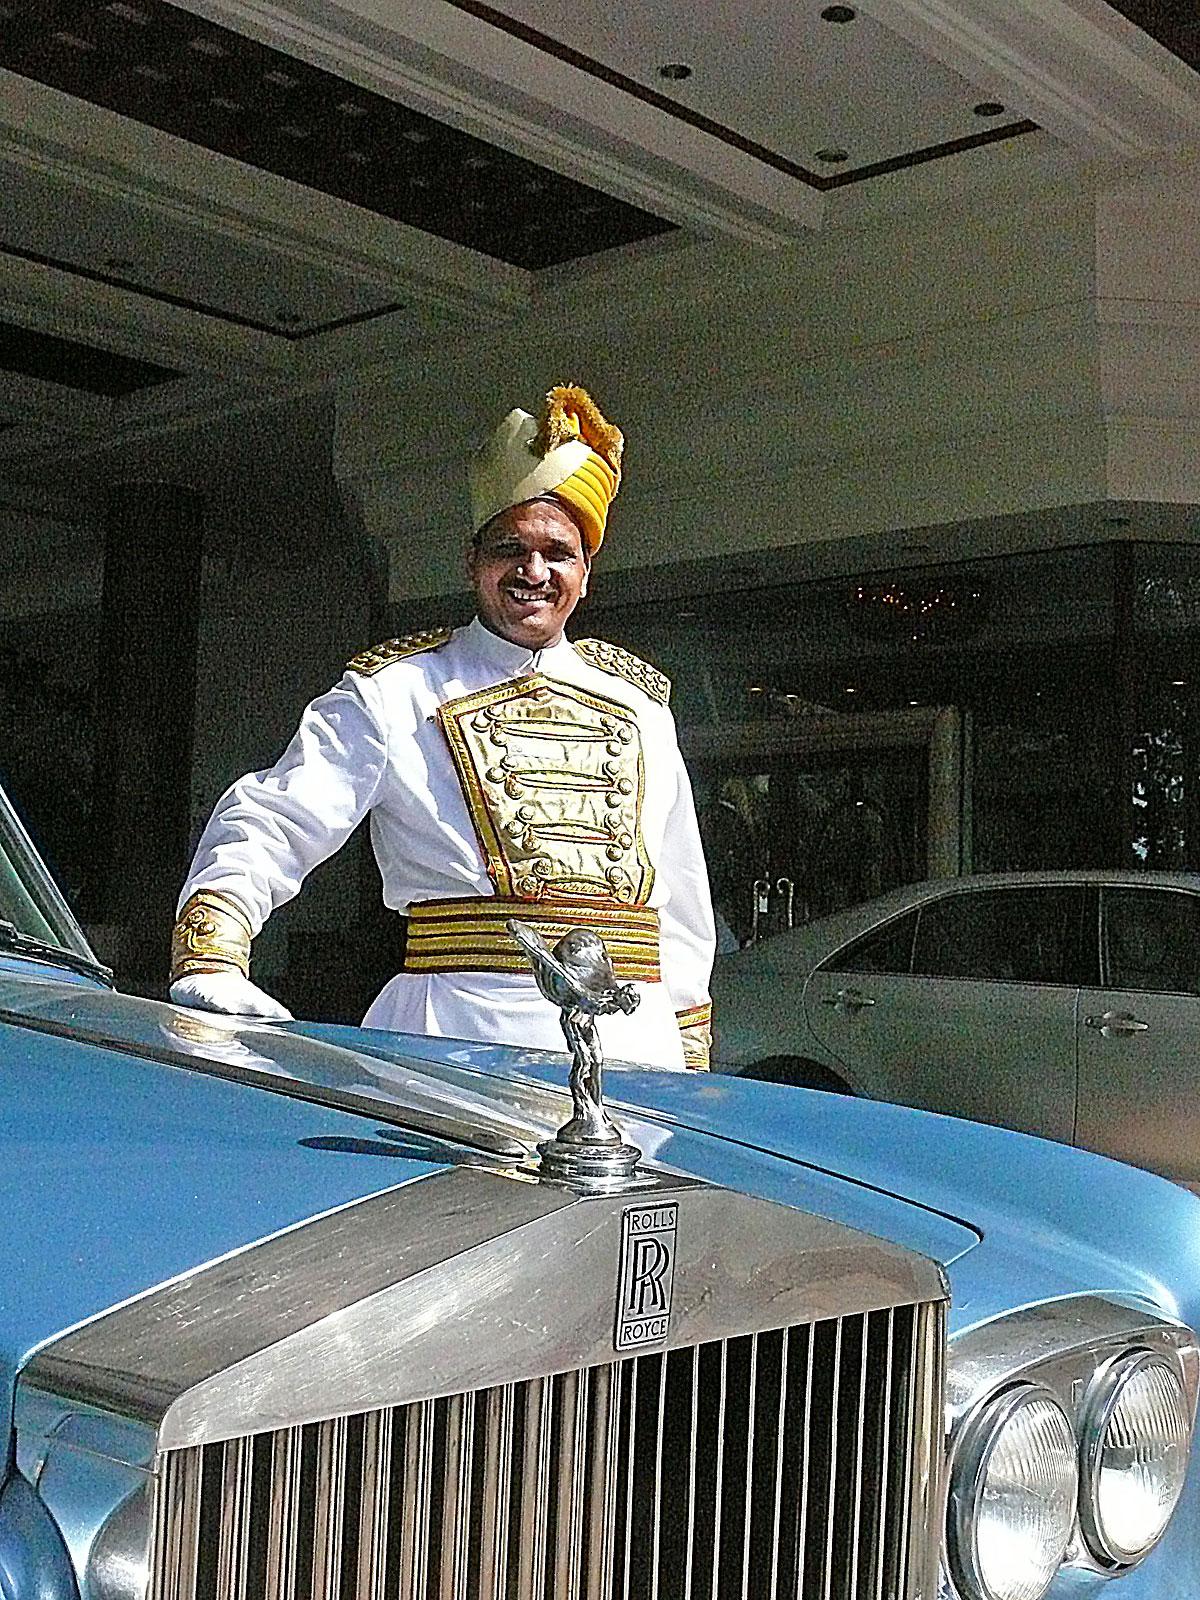 INDIEN MUMBAI Hotel The Leela FINEST-onTour DP1030309.jpg